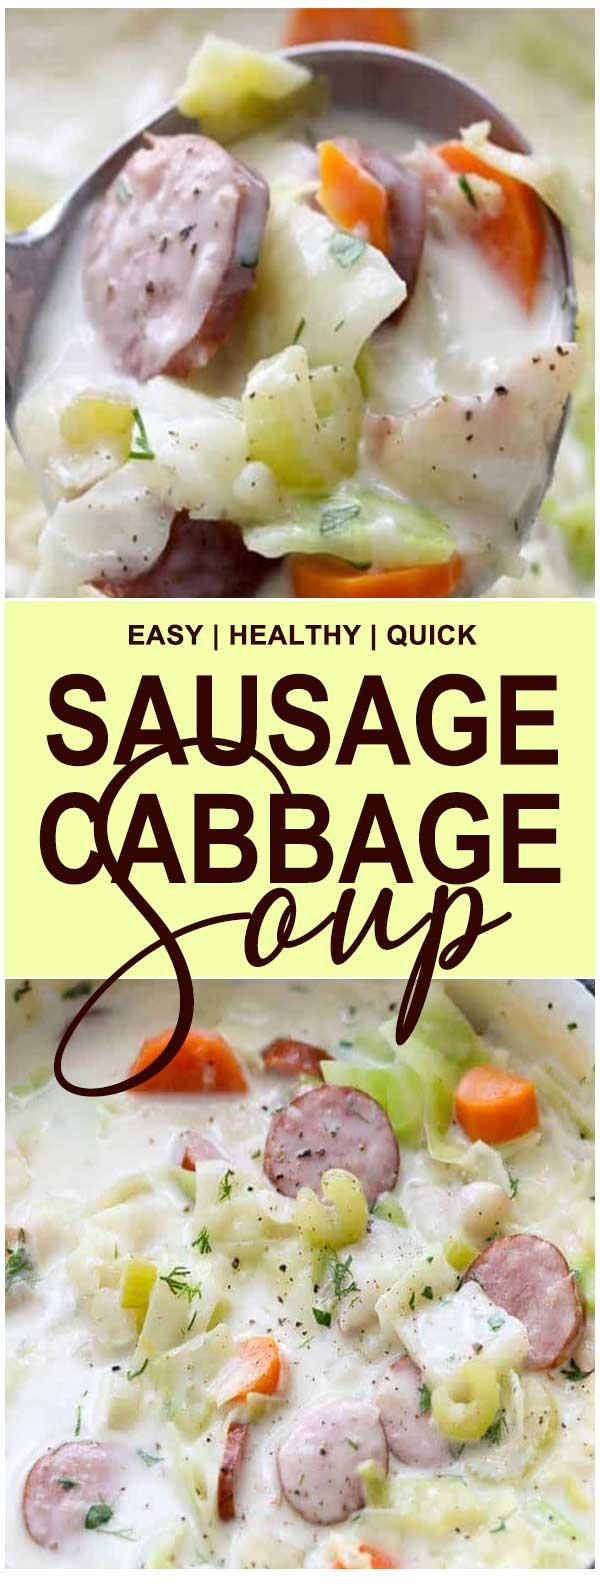 Sausage & Cabbage Soup